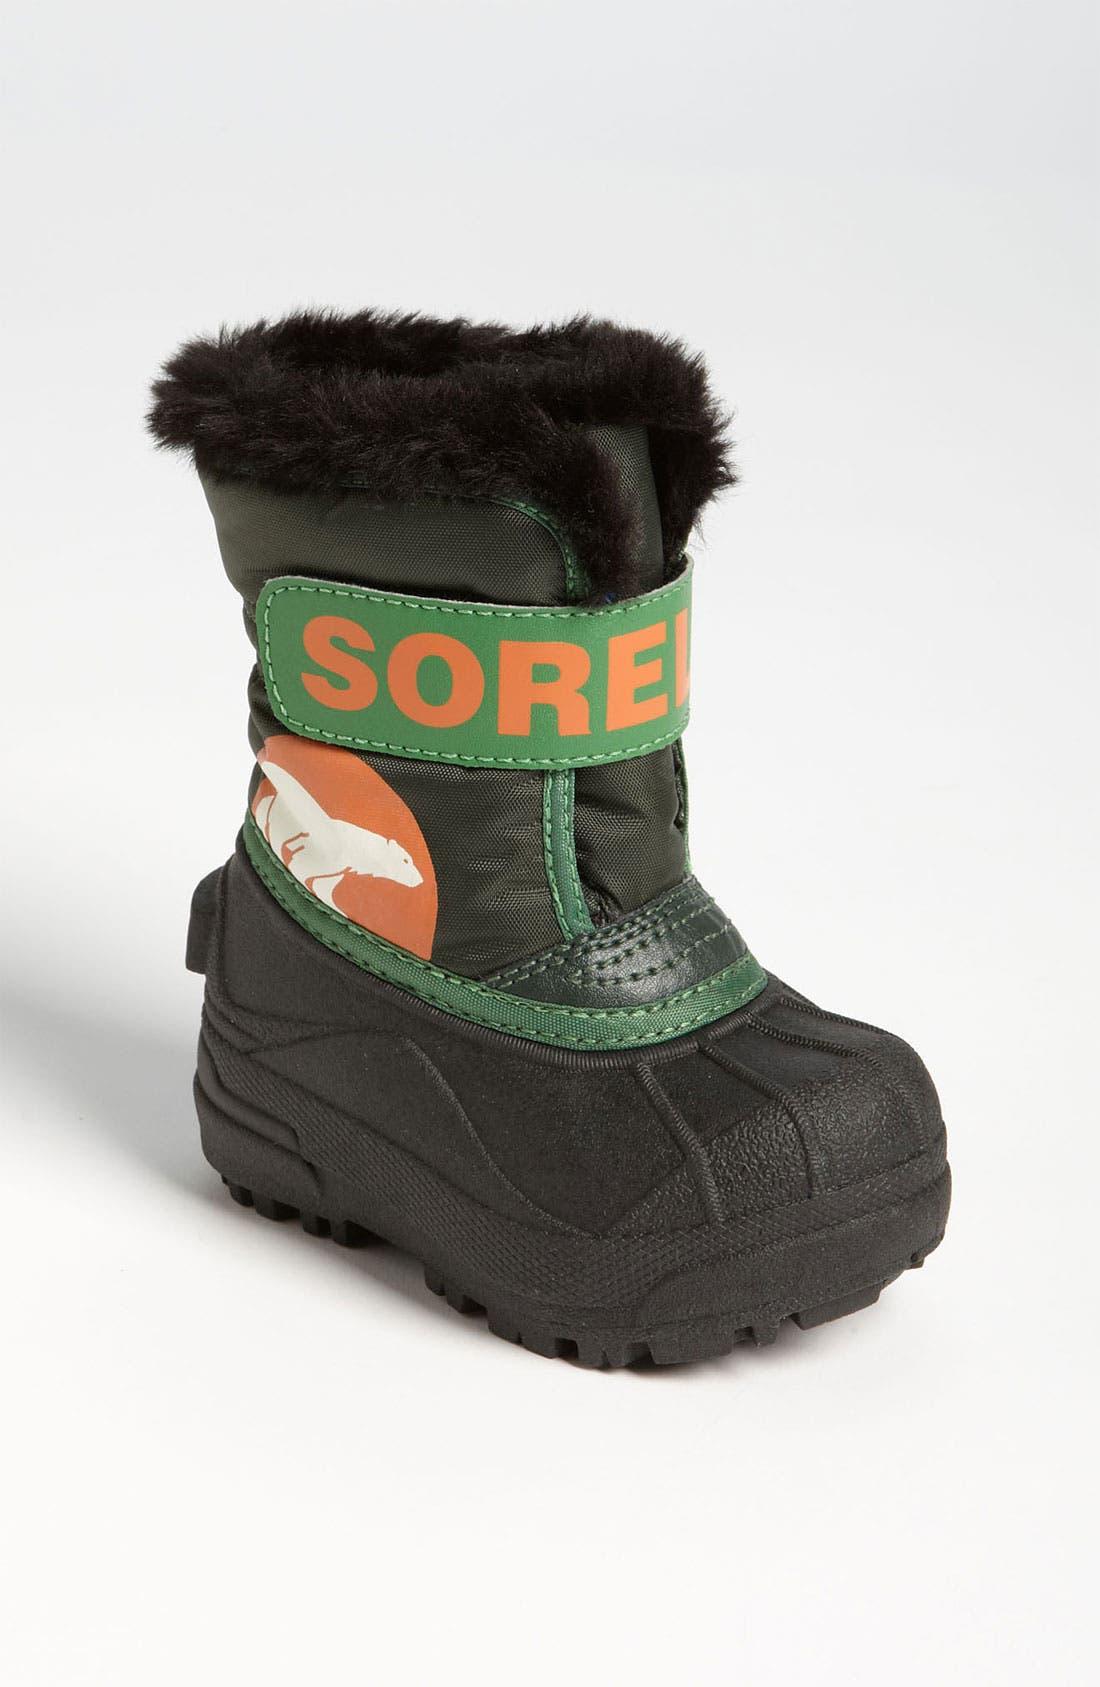 Alternate Image 1 Selected - SOREL 'Snow Commander' Boot (Baby & Walker)